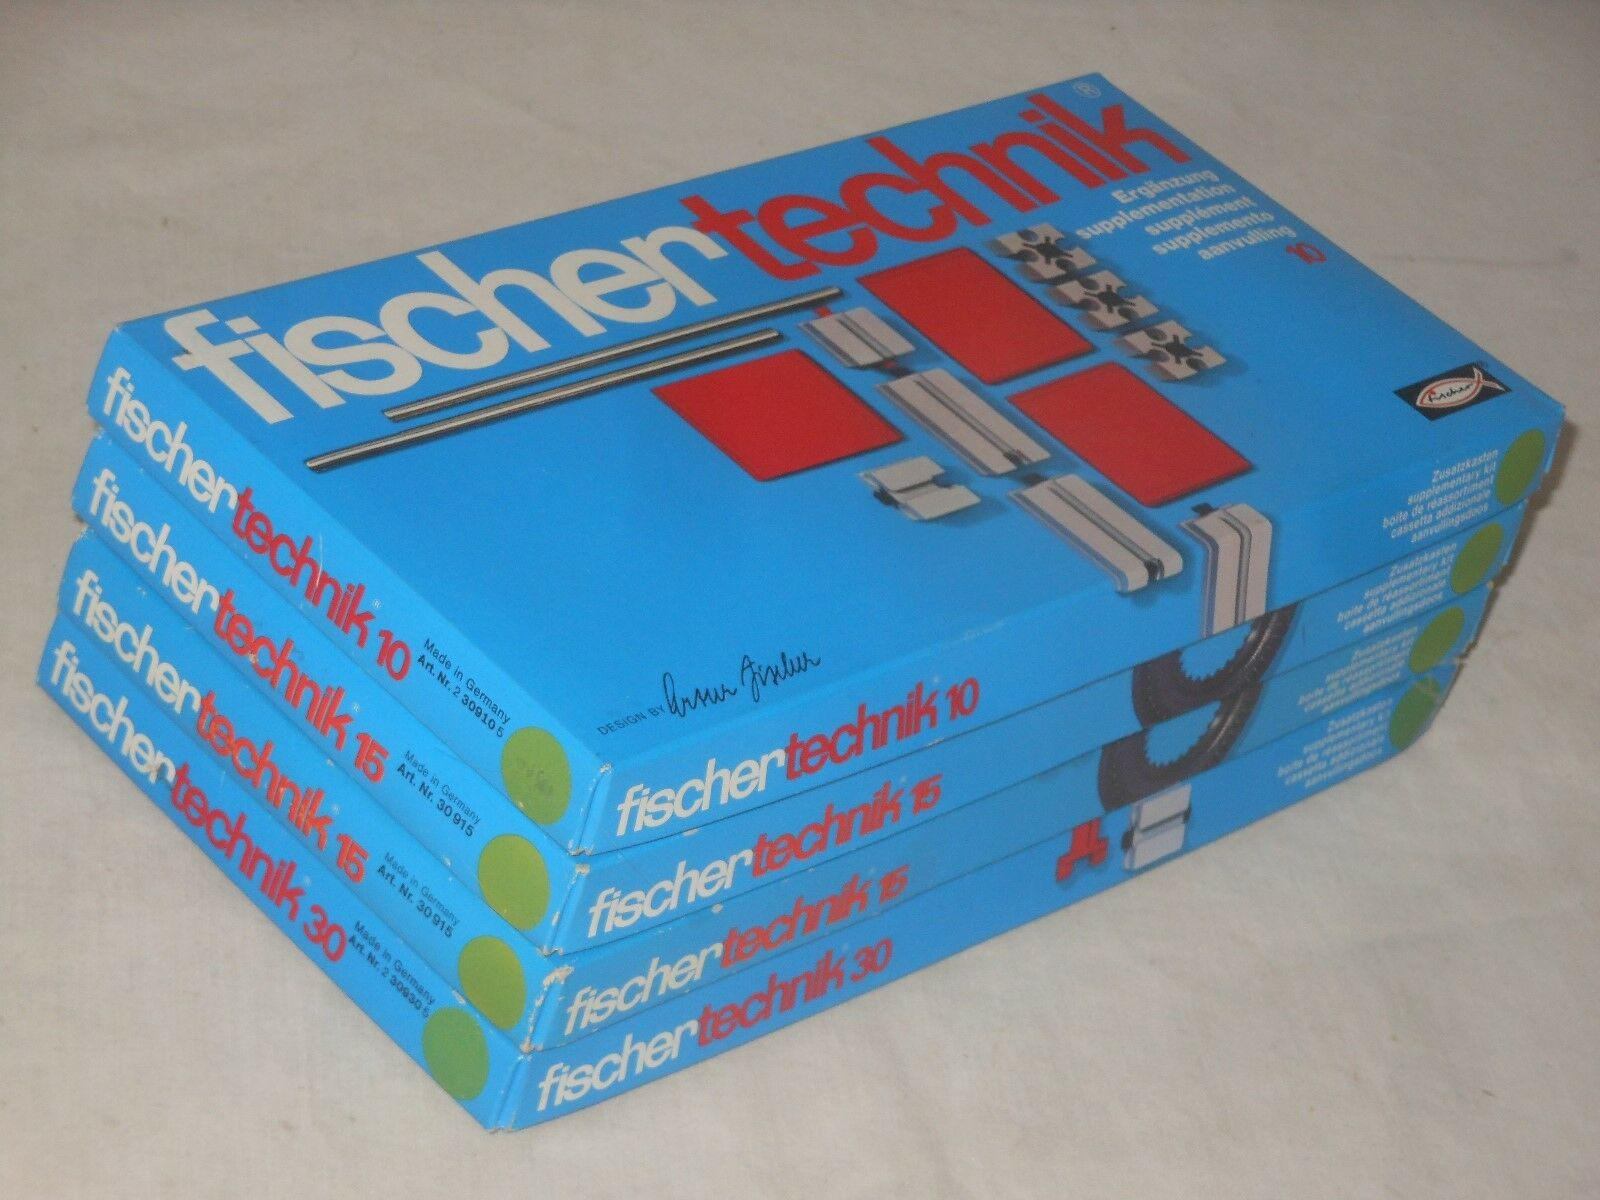 Fischertechnik Mega Lot - Sets 10+2 x 15 +30 - Ovp - Complete